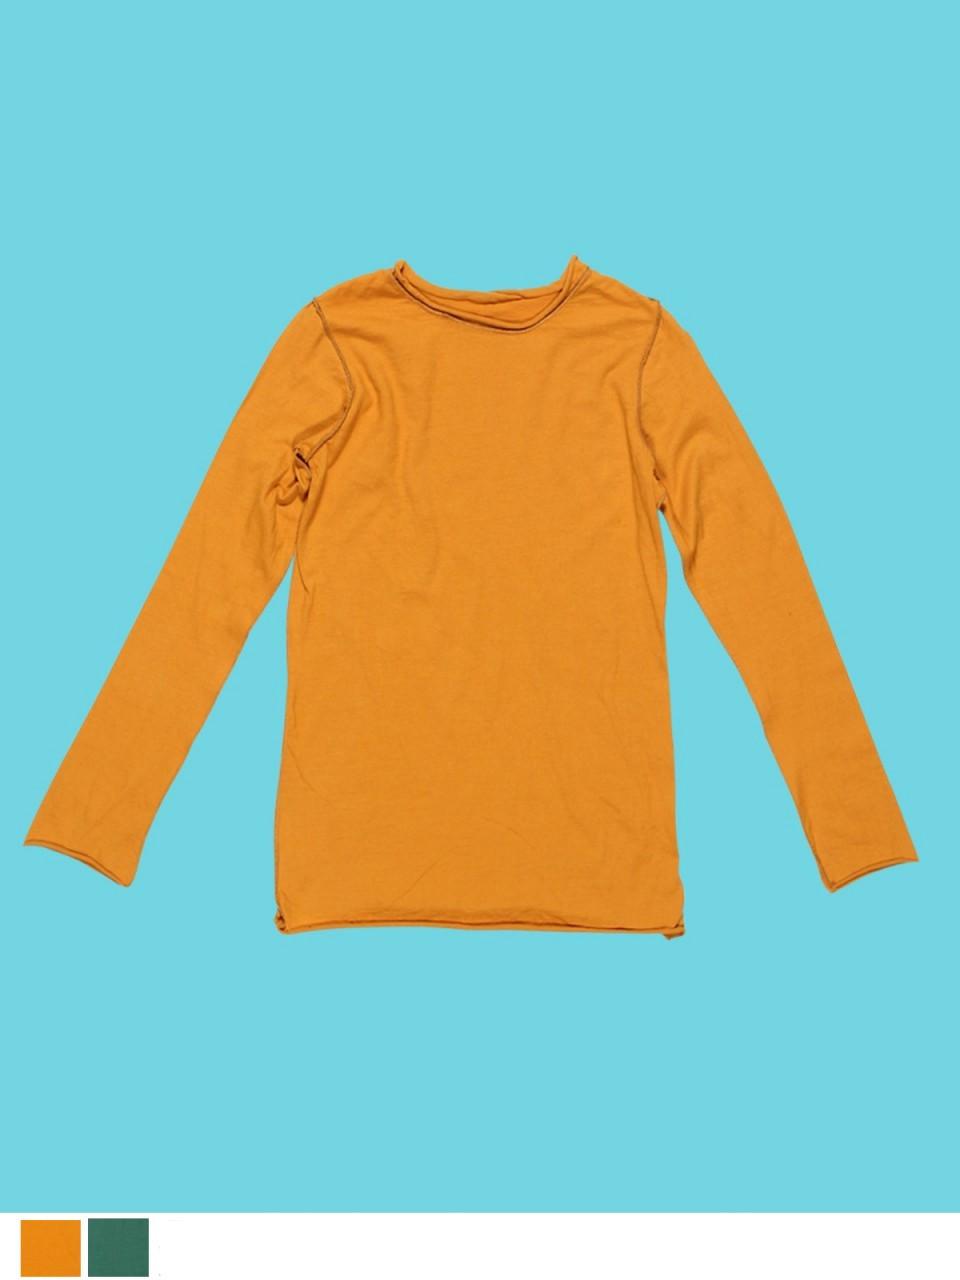 Boys Long Sleeve Plain T-Shirt - Organic Cotton Jersey - Solne Eco  Department Store